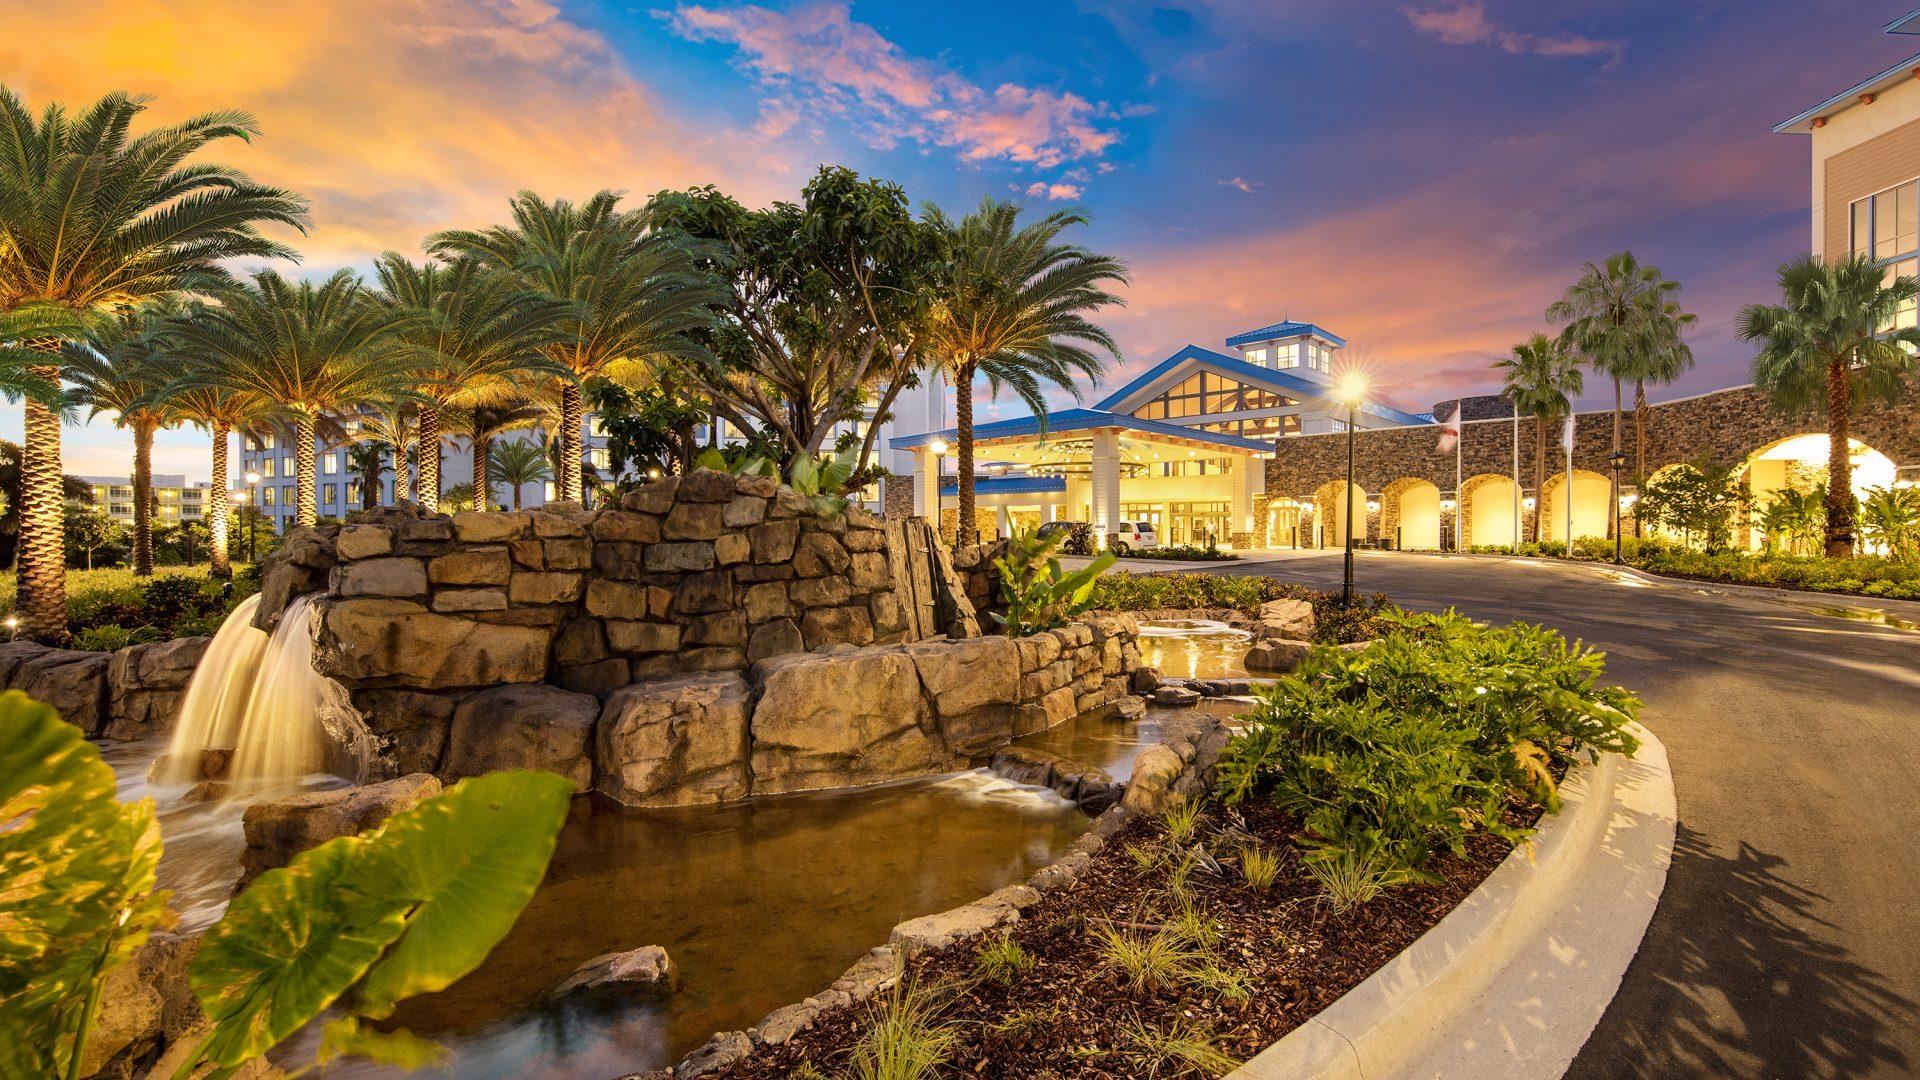 Loews Hotels Resorts Photos Section Image